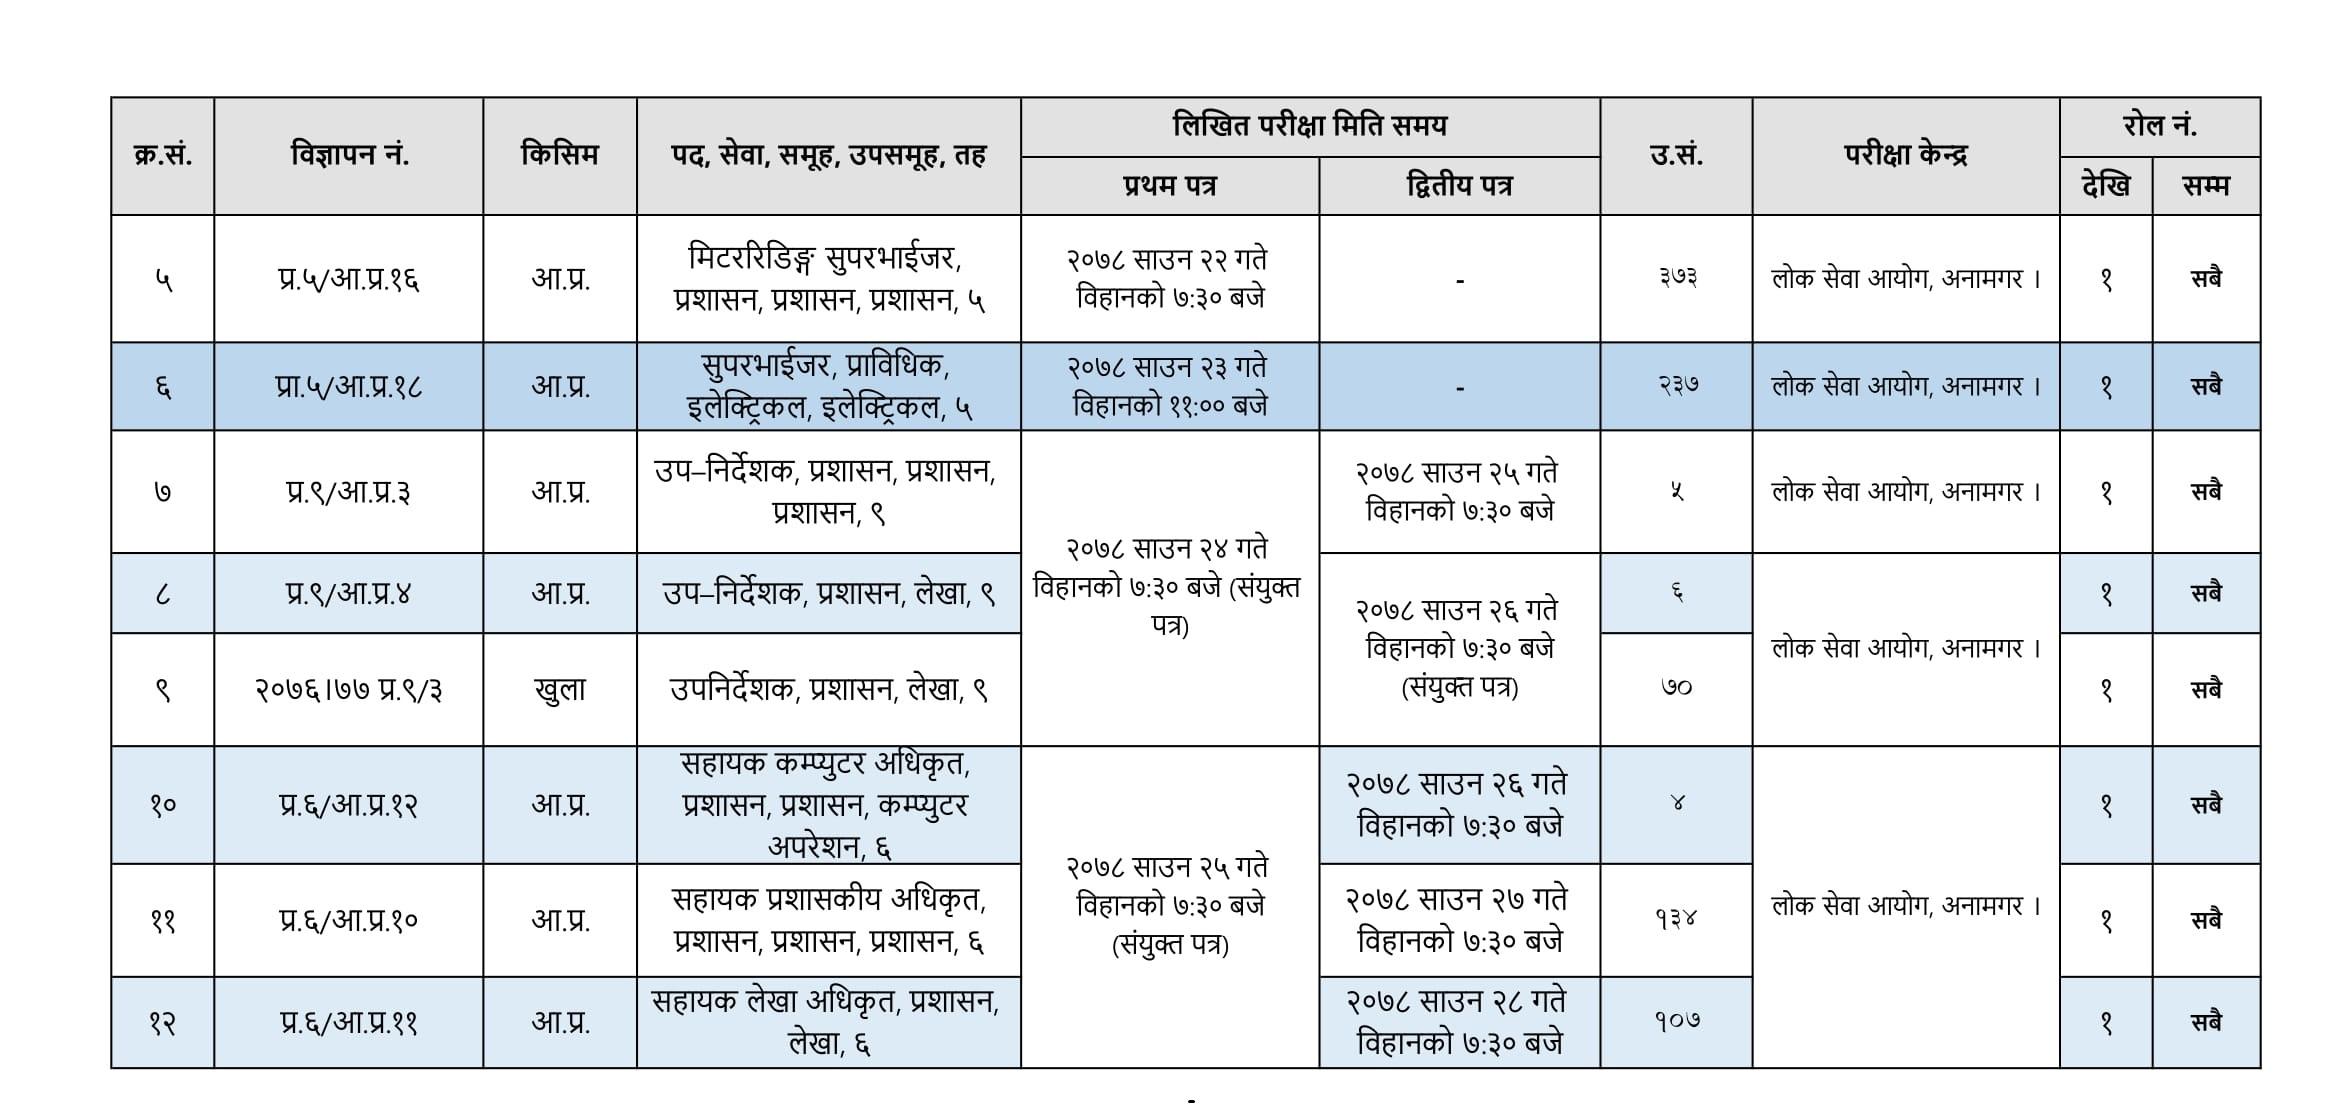 Nepal Electricity Authority (NEA) Written Exam Notice